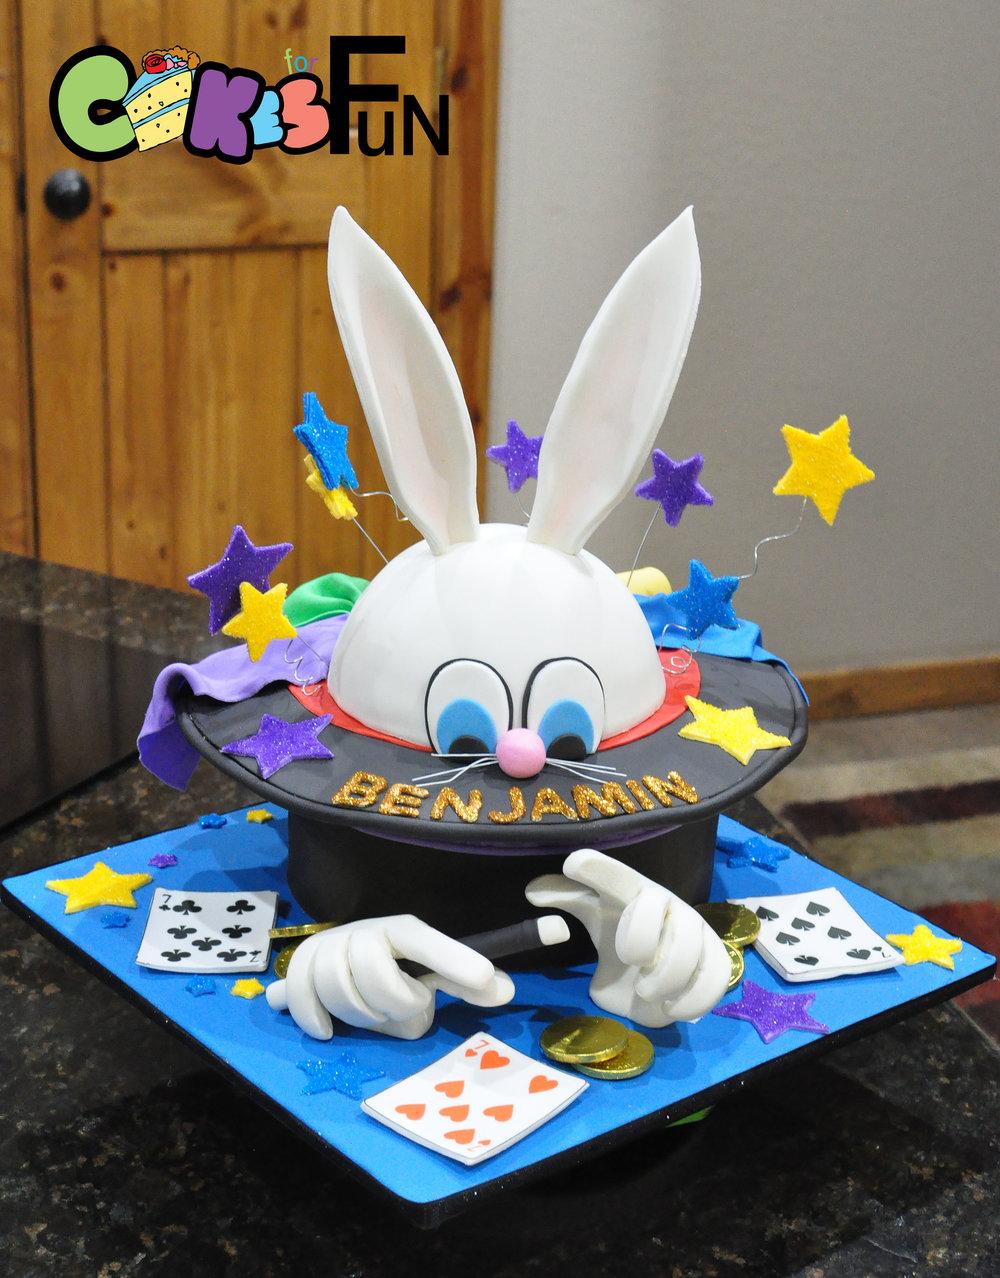 Magicians cake-daisy.jpg